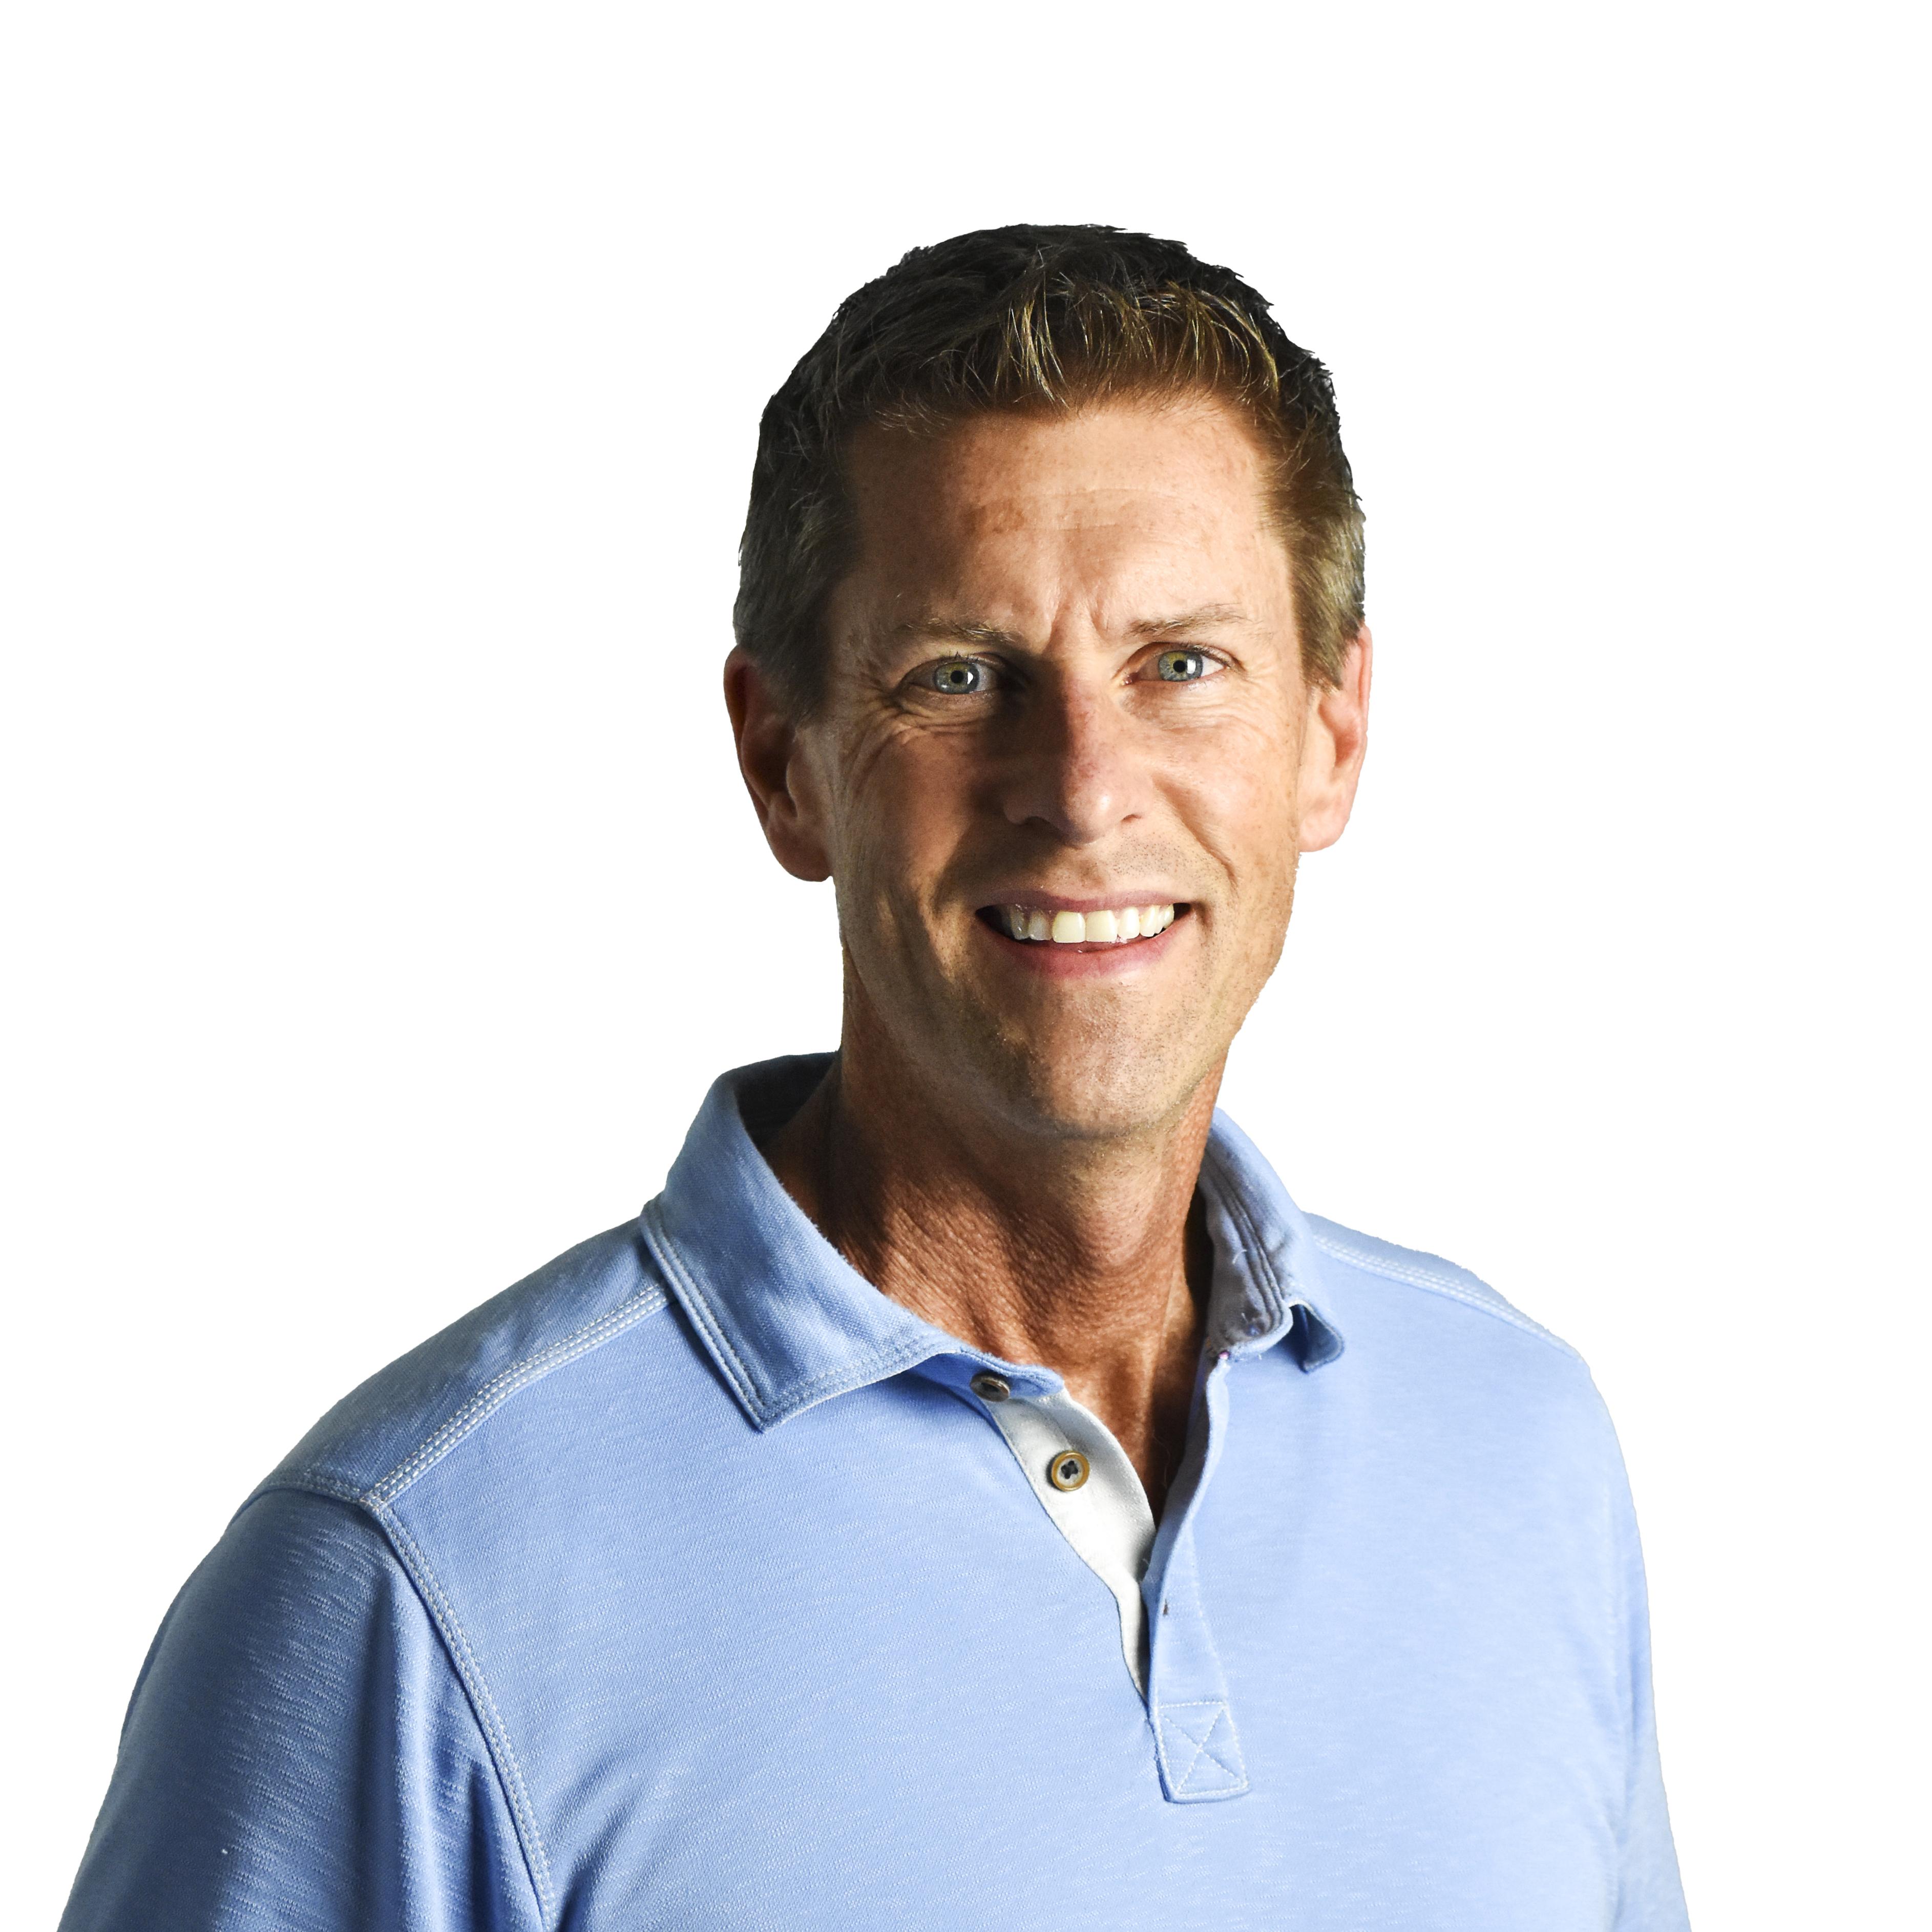 Michael Verkamp